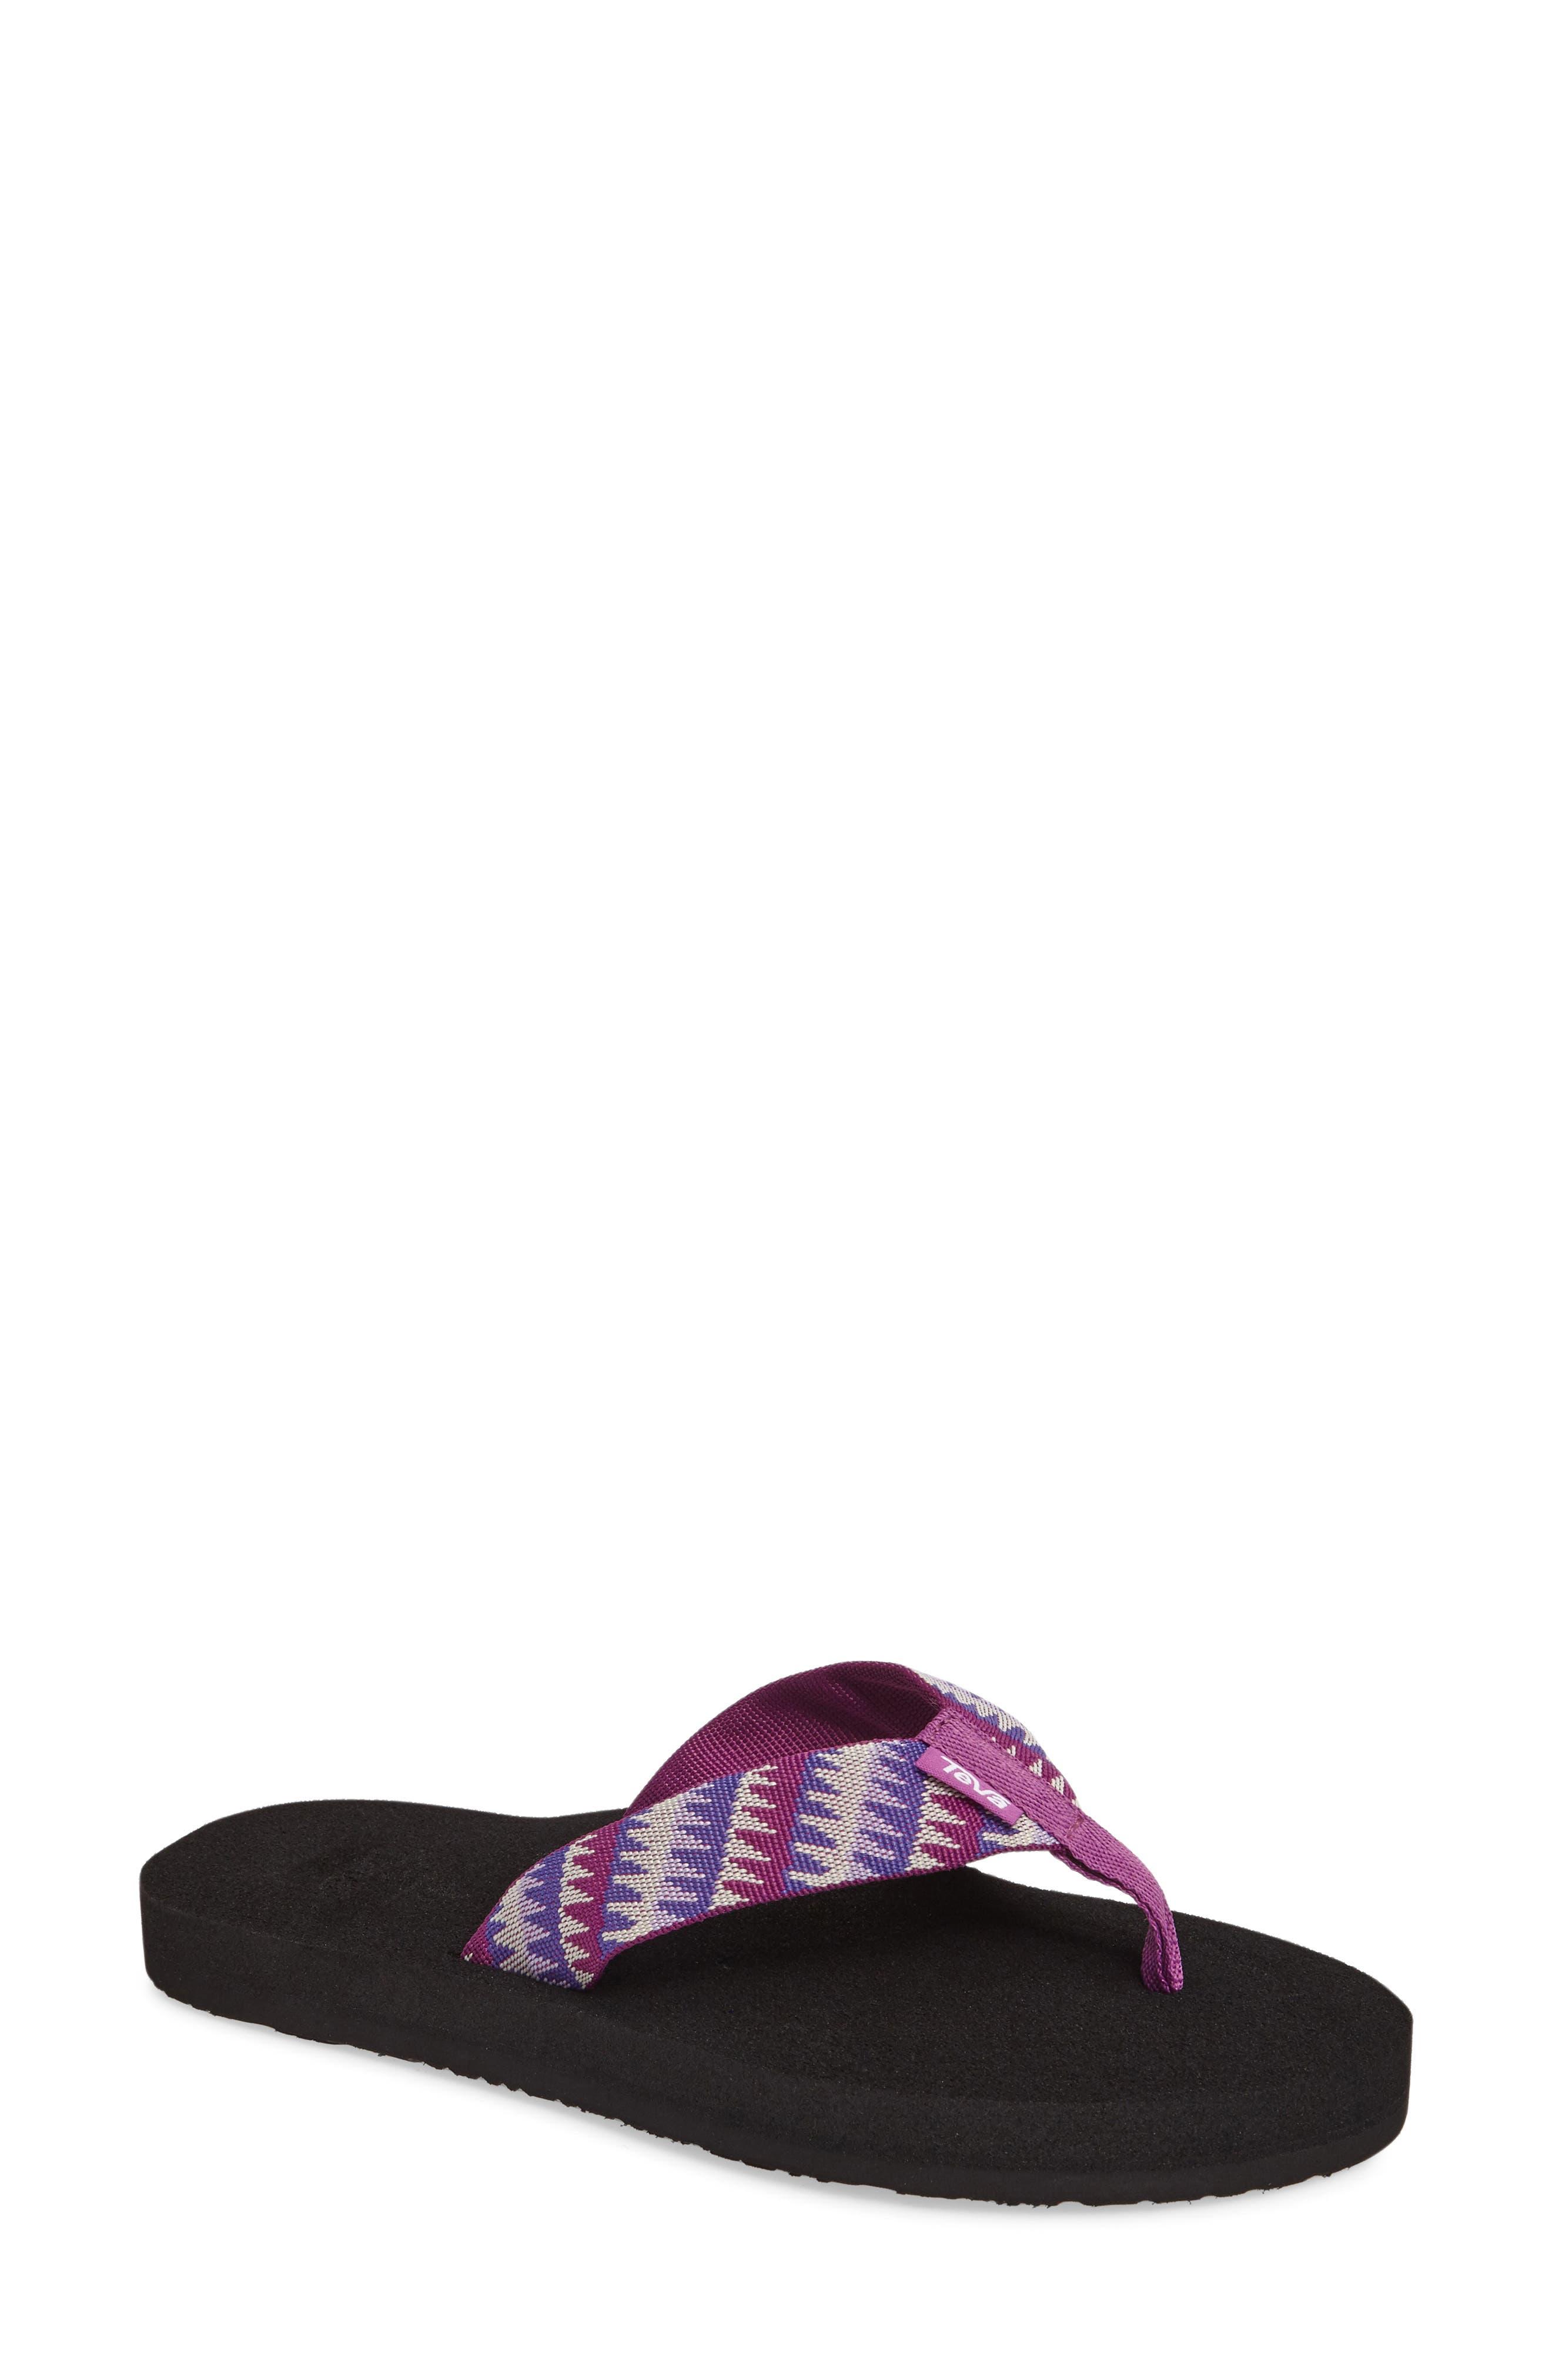 Alternate Image 1 Selected - Teva Mush II Flip Flop (Women)